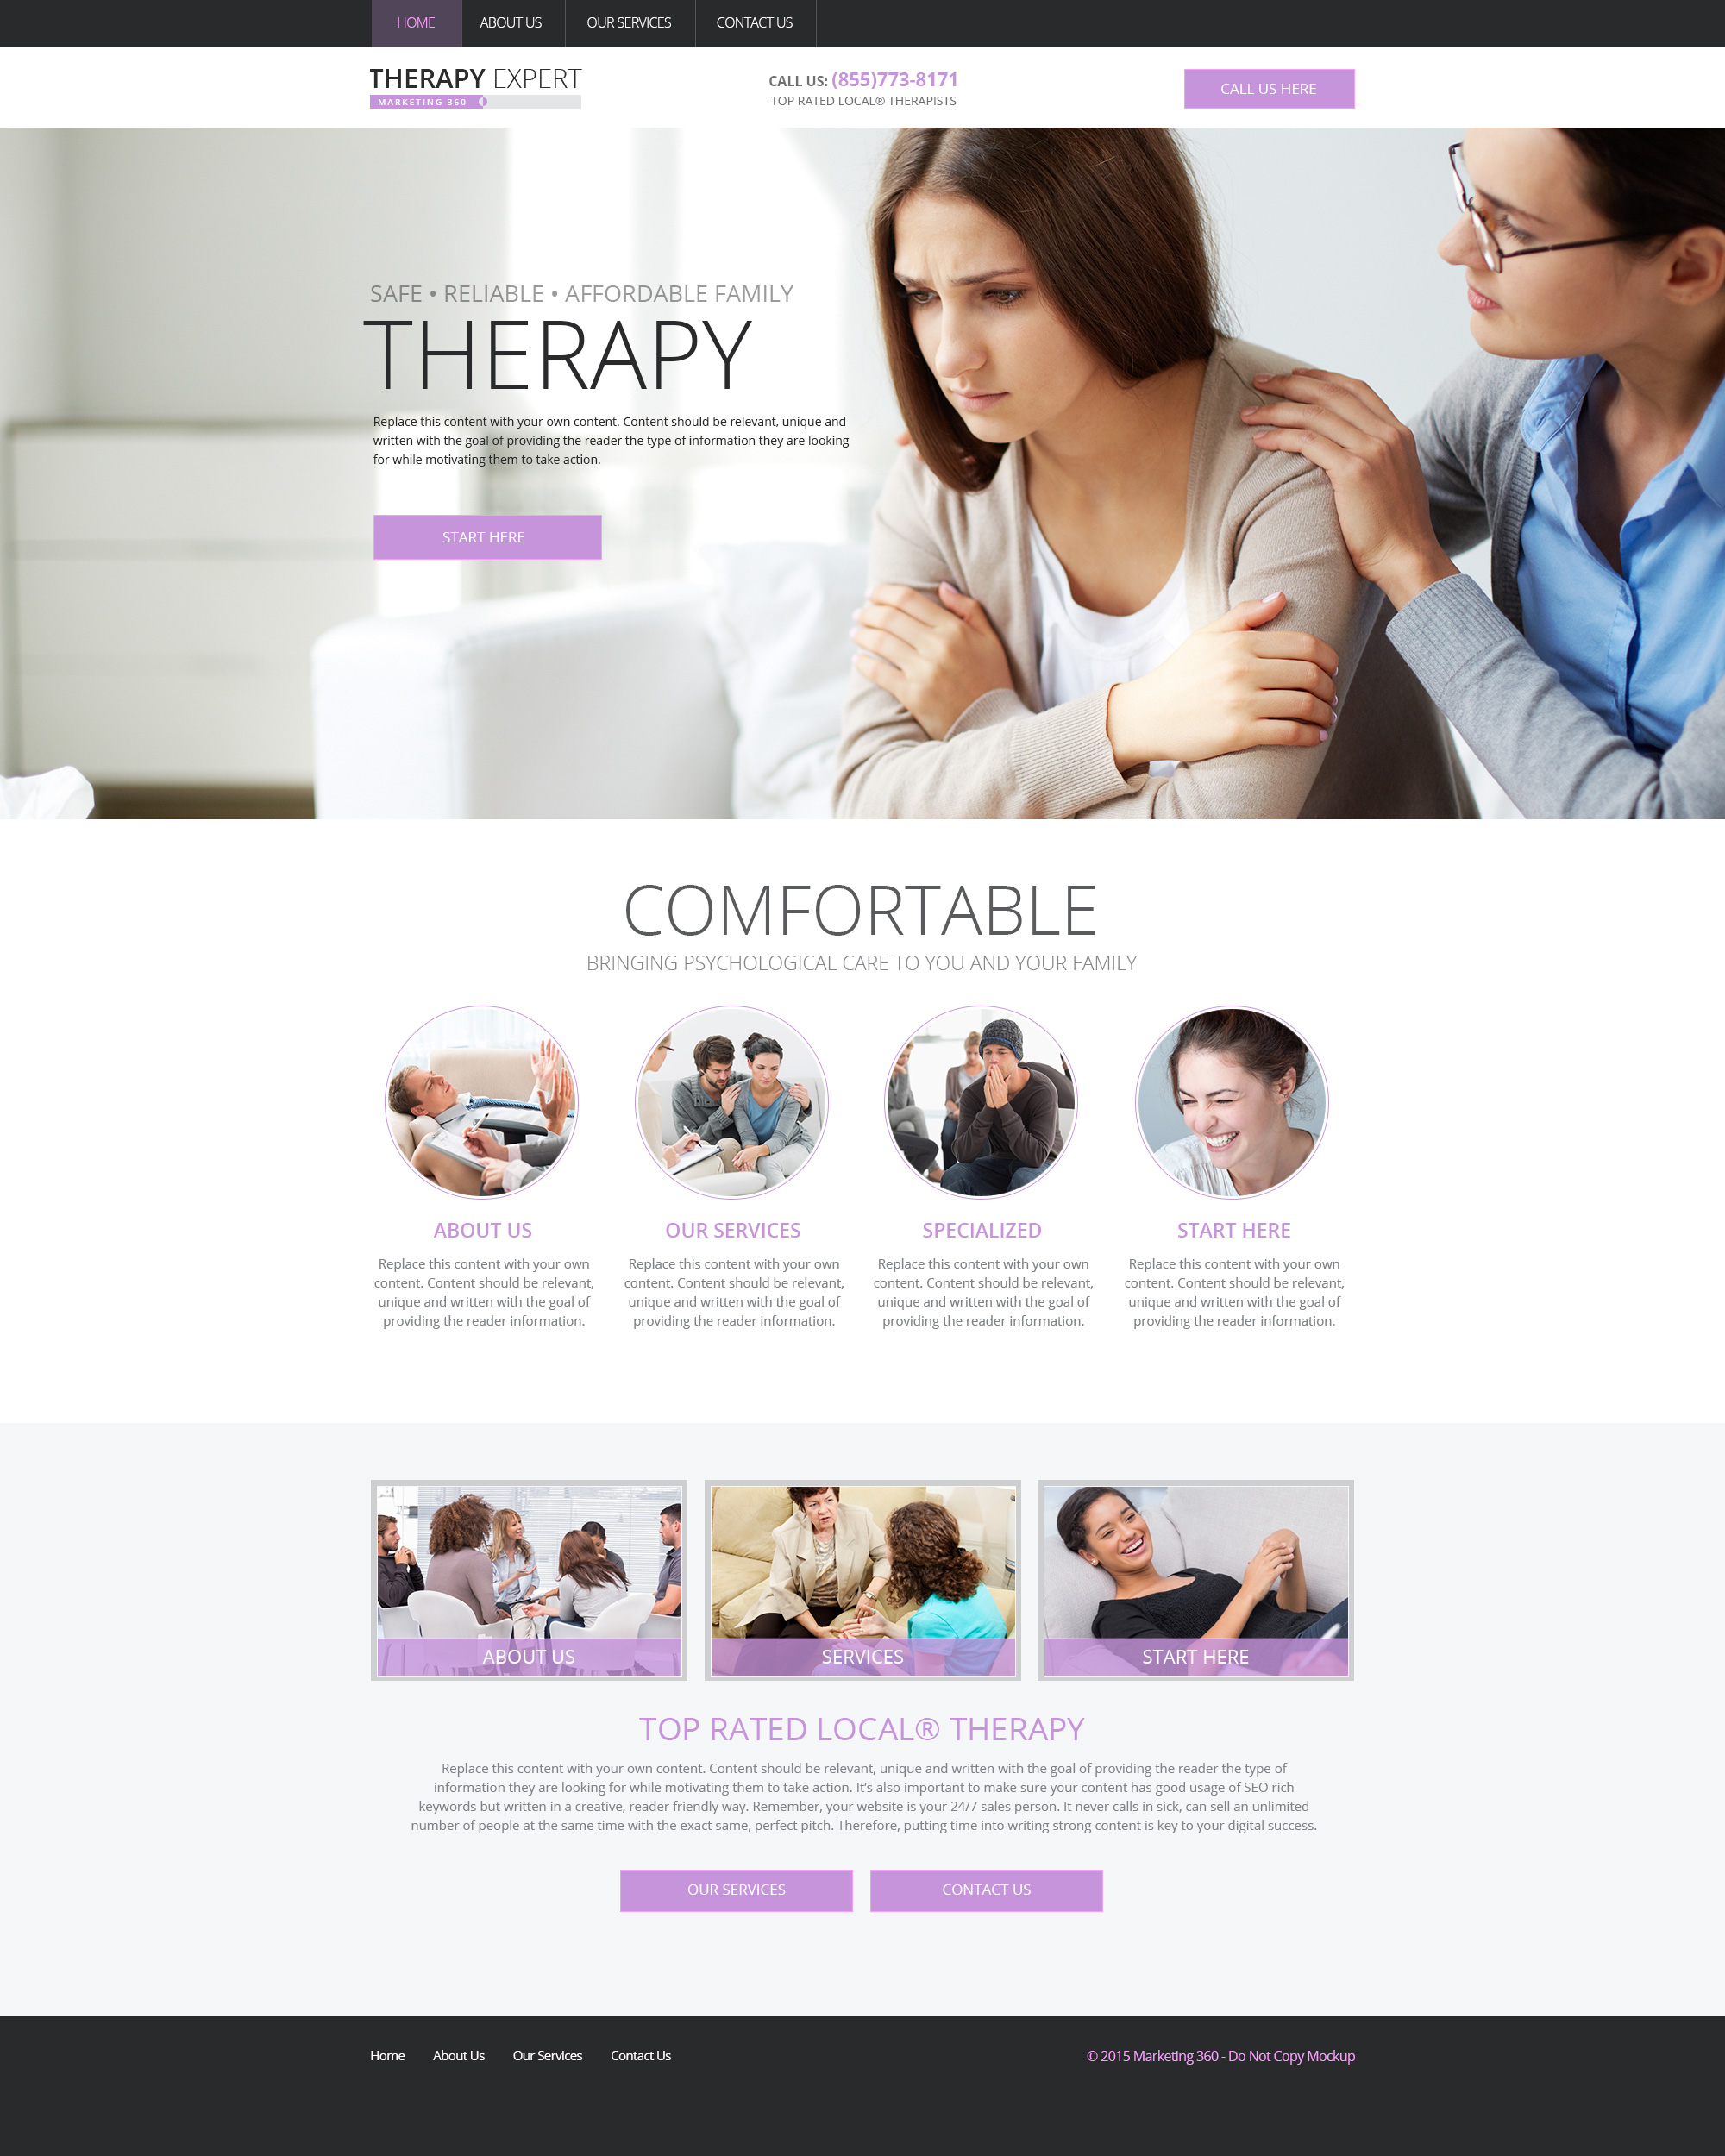 websites for therapists mobile responsive templates designs. Black Bedroom Furniture Sets. Home Design Ideas